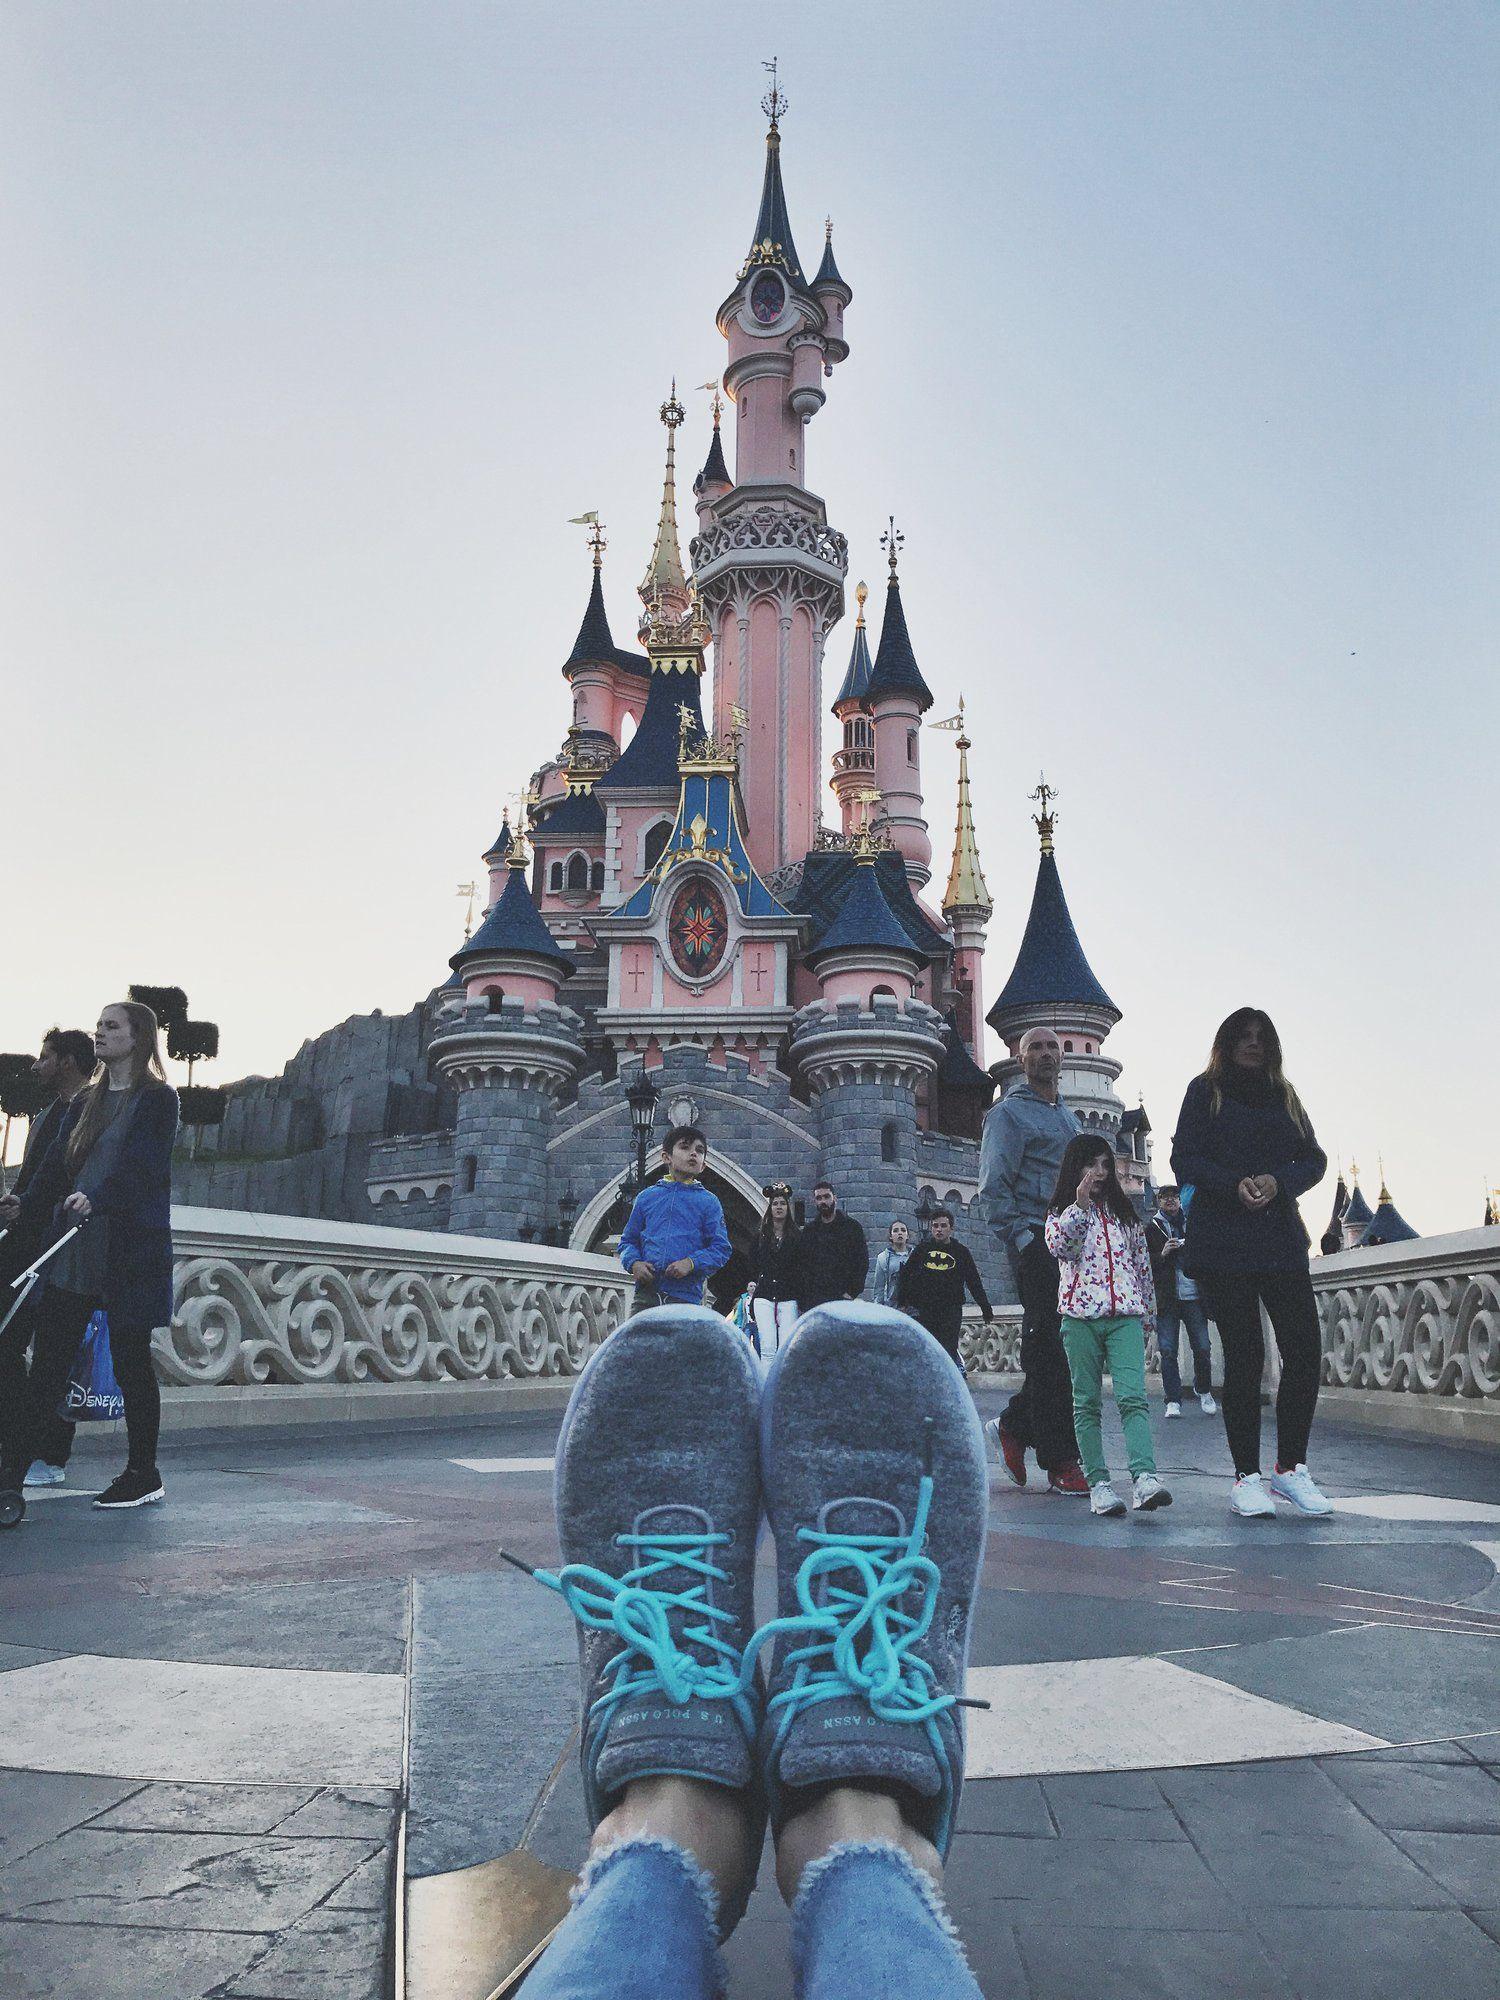 Disneyland Paris wanderinsoles france paris bucketlist disney travel